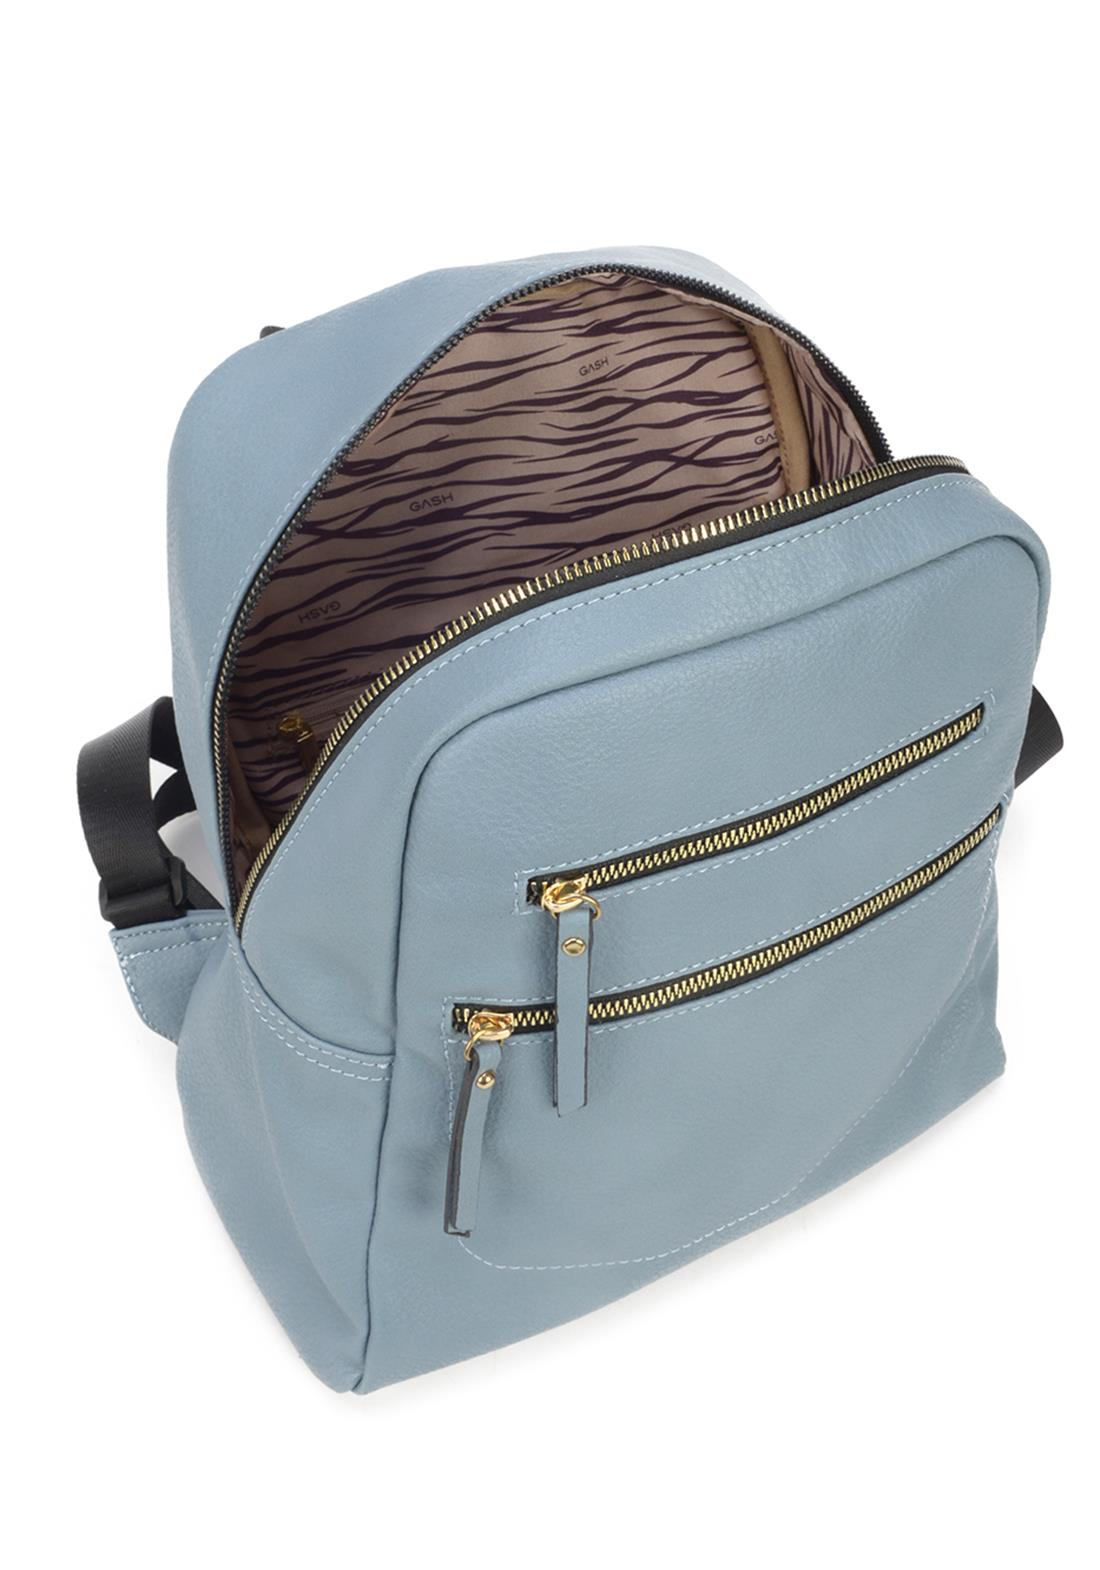 Bolsa Mochila Feminina Gash Azul Couro Sintetico Original